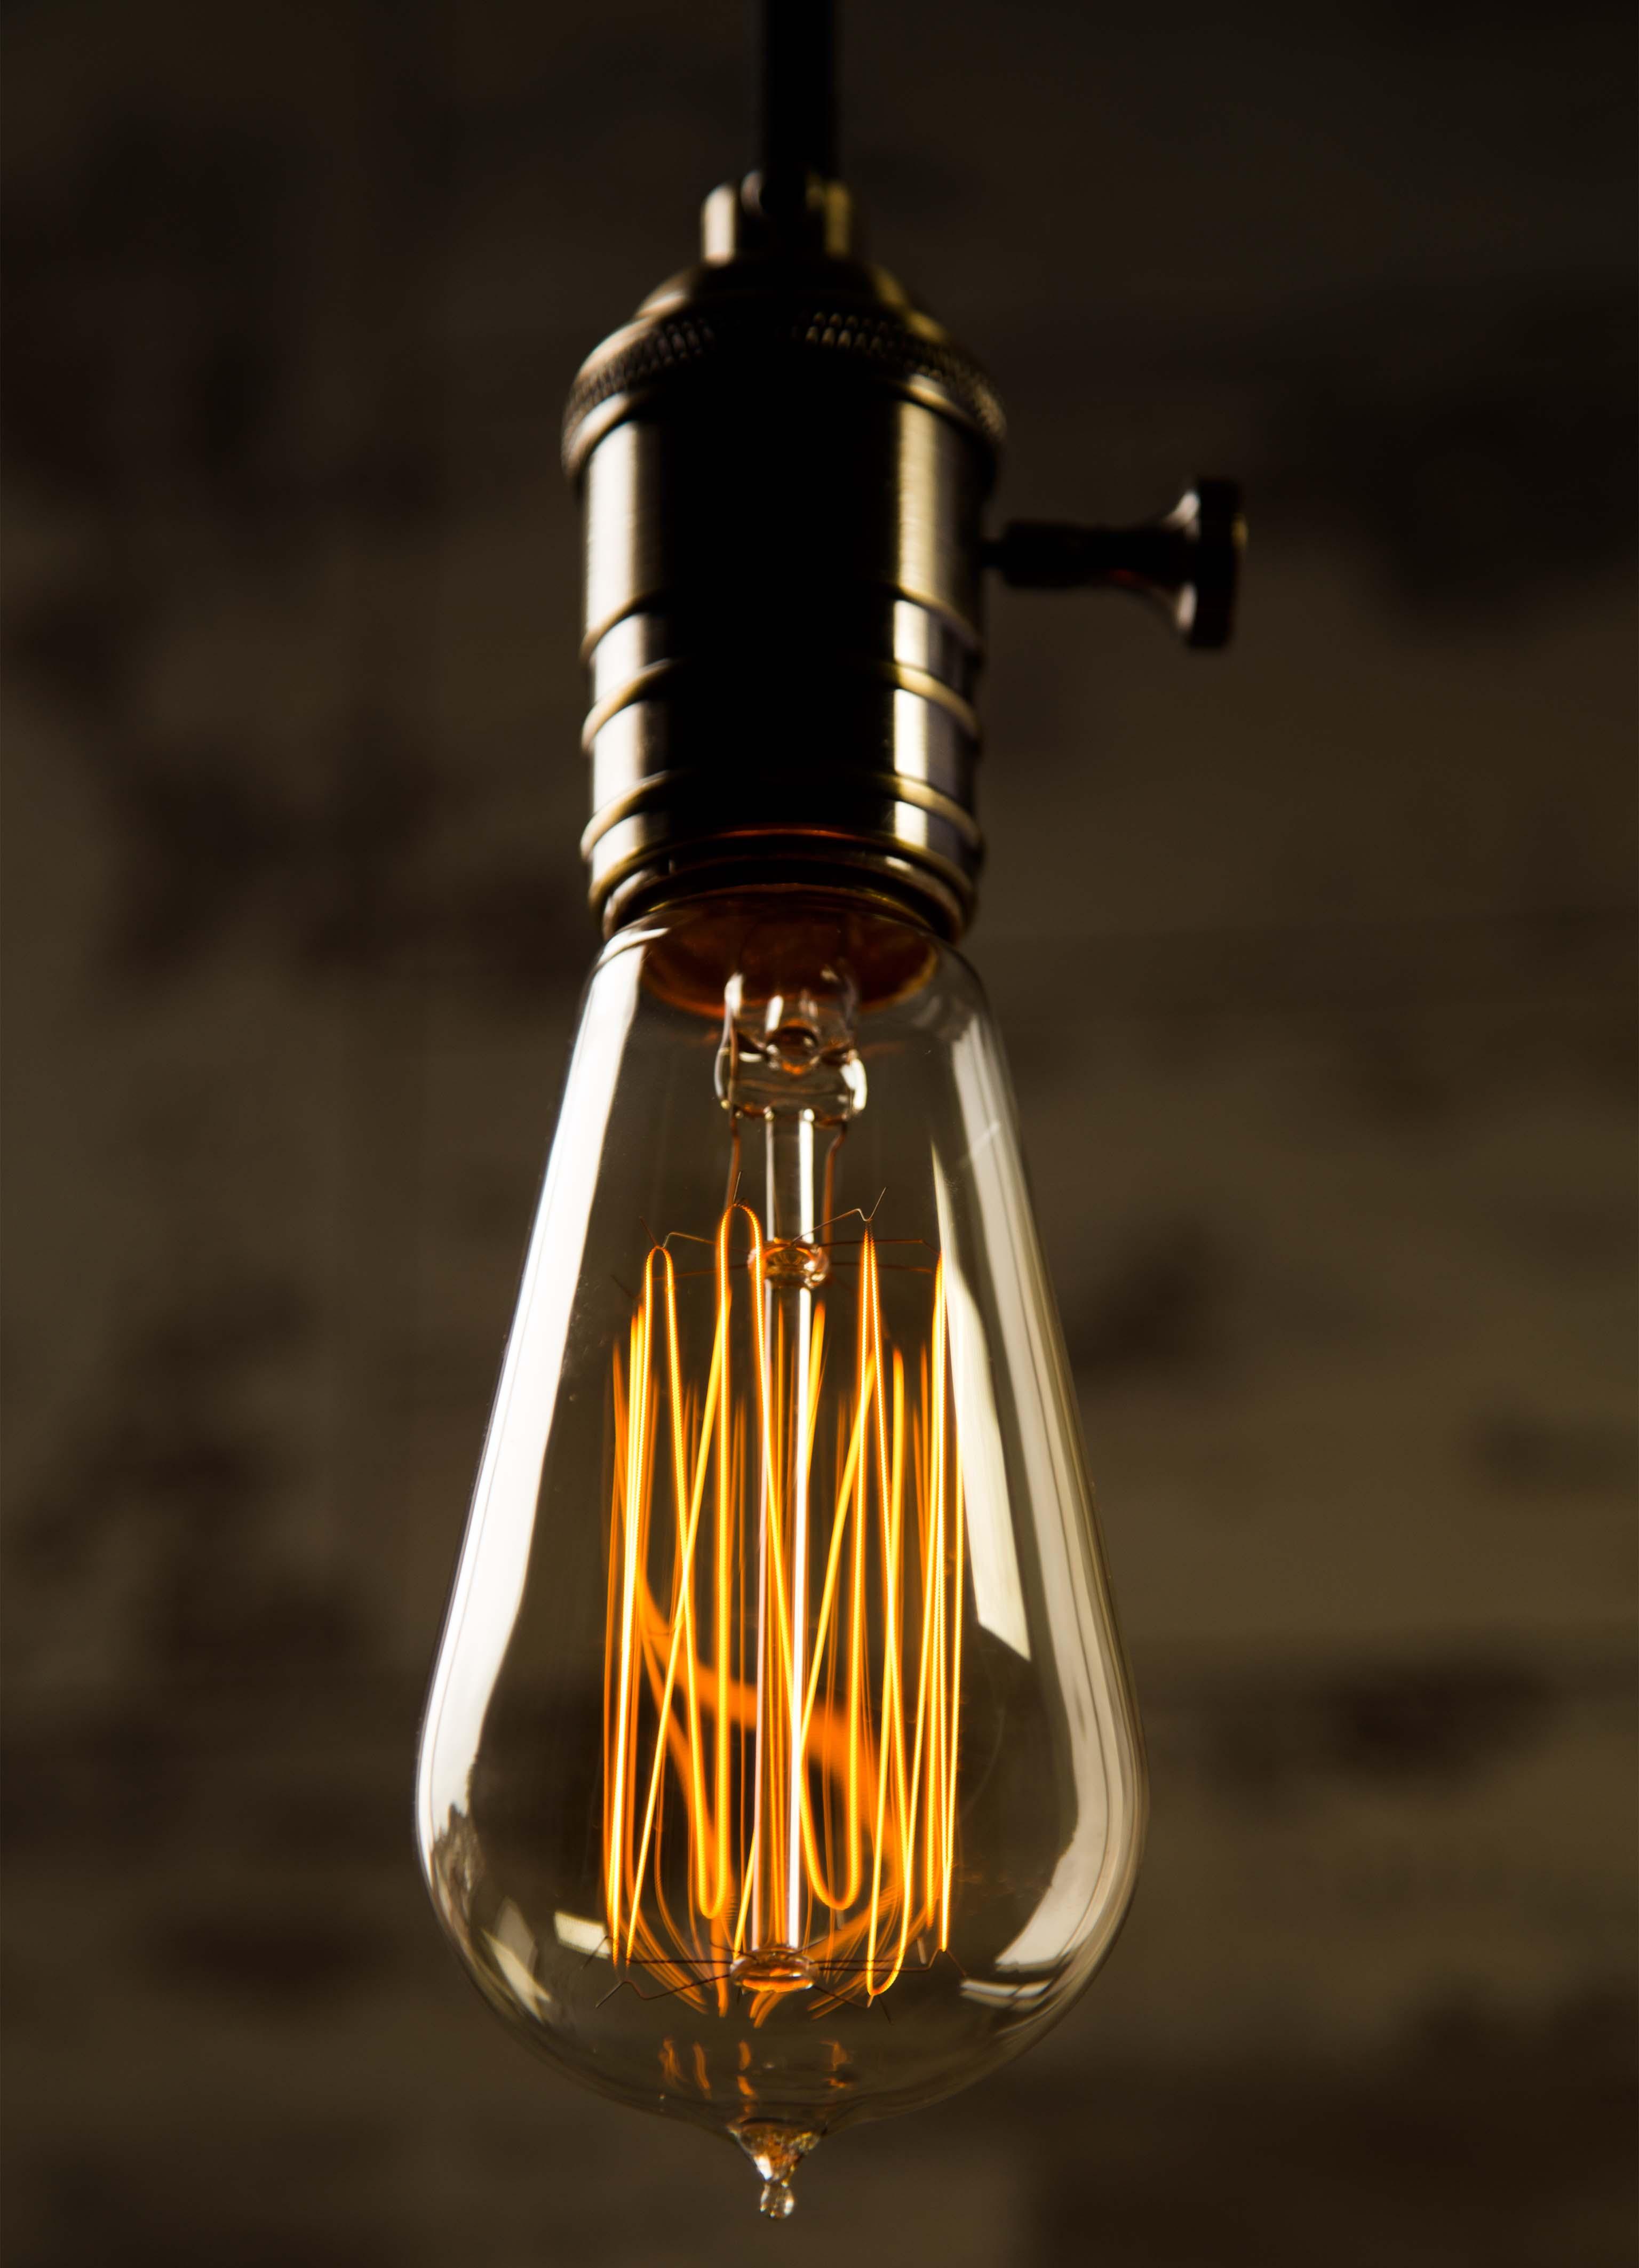 Teardrop st64 william and watson vintage edison bulb industrial light - Teardrop Medium William And Watson Industrial Vintage Retro Edison Light Bulb White Copy Black Teardrop Cropped Img_2237 Teardrop Med Lowangle Cropped